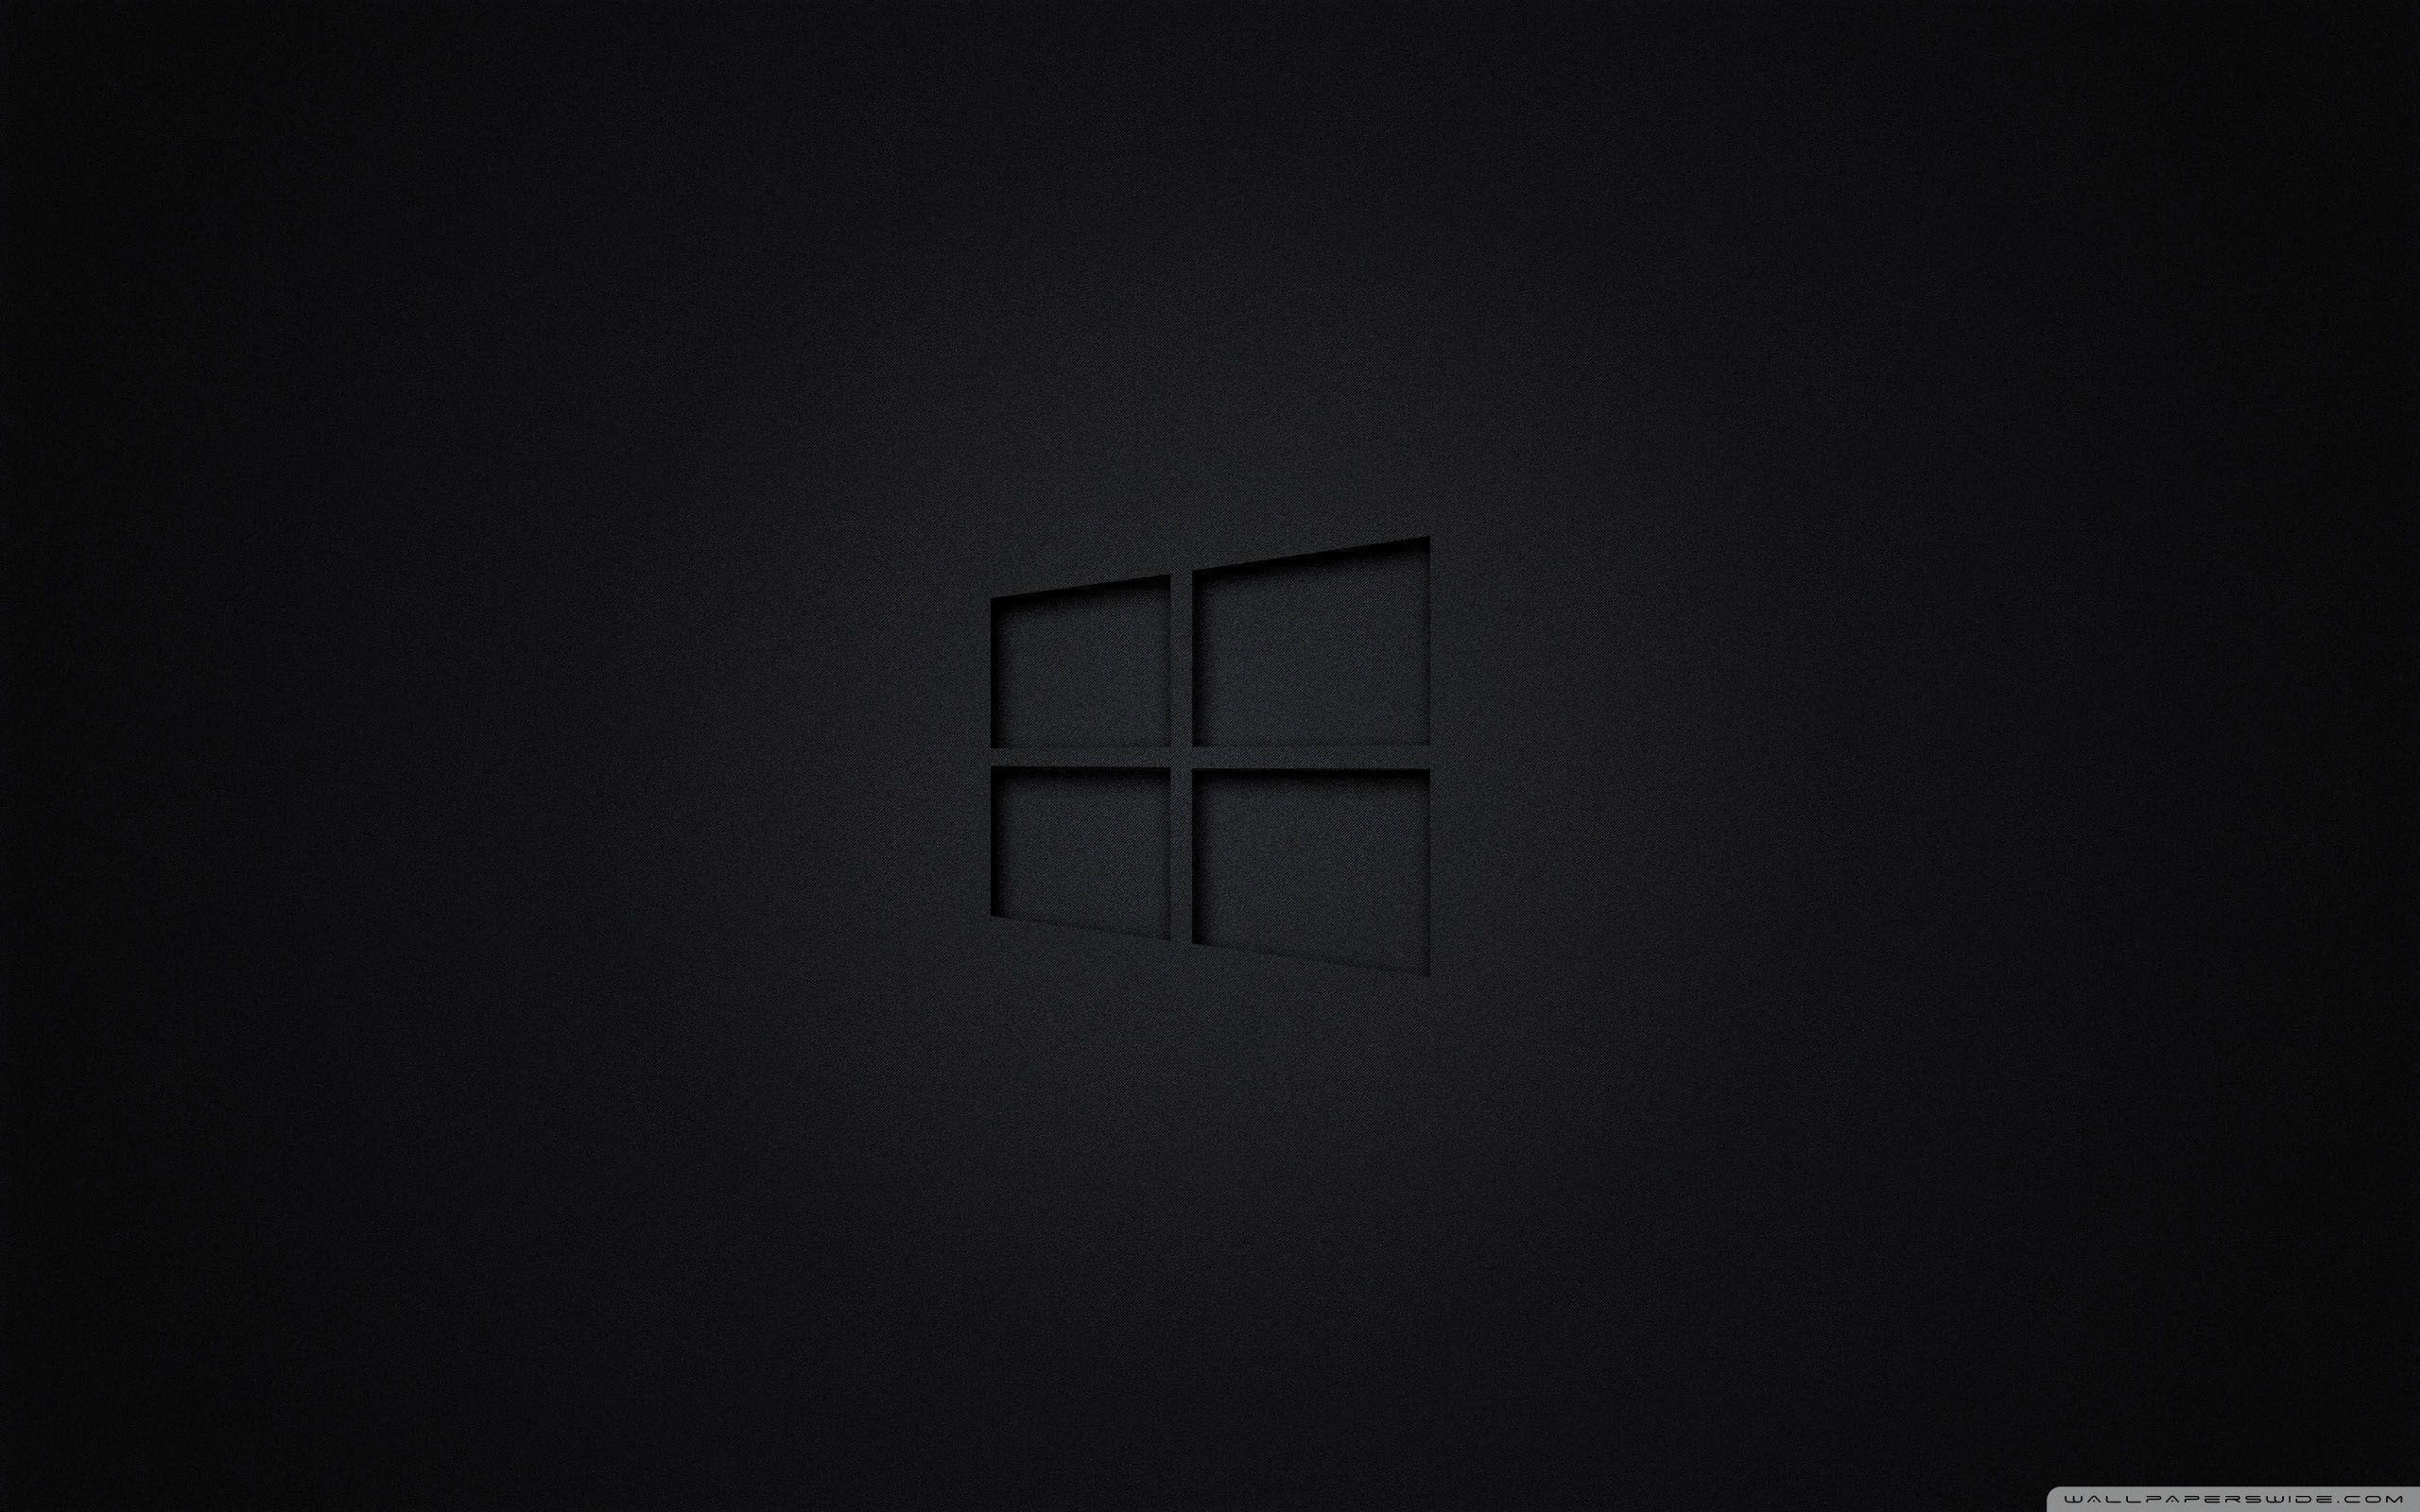 Dark Windows Wallpapers Top Free Dark Windows Backgrounds Wallpaperaccess